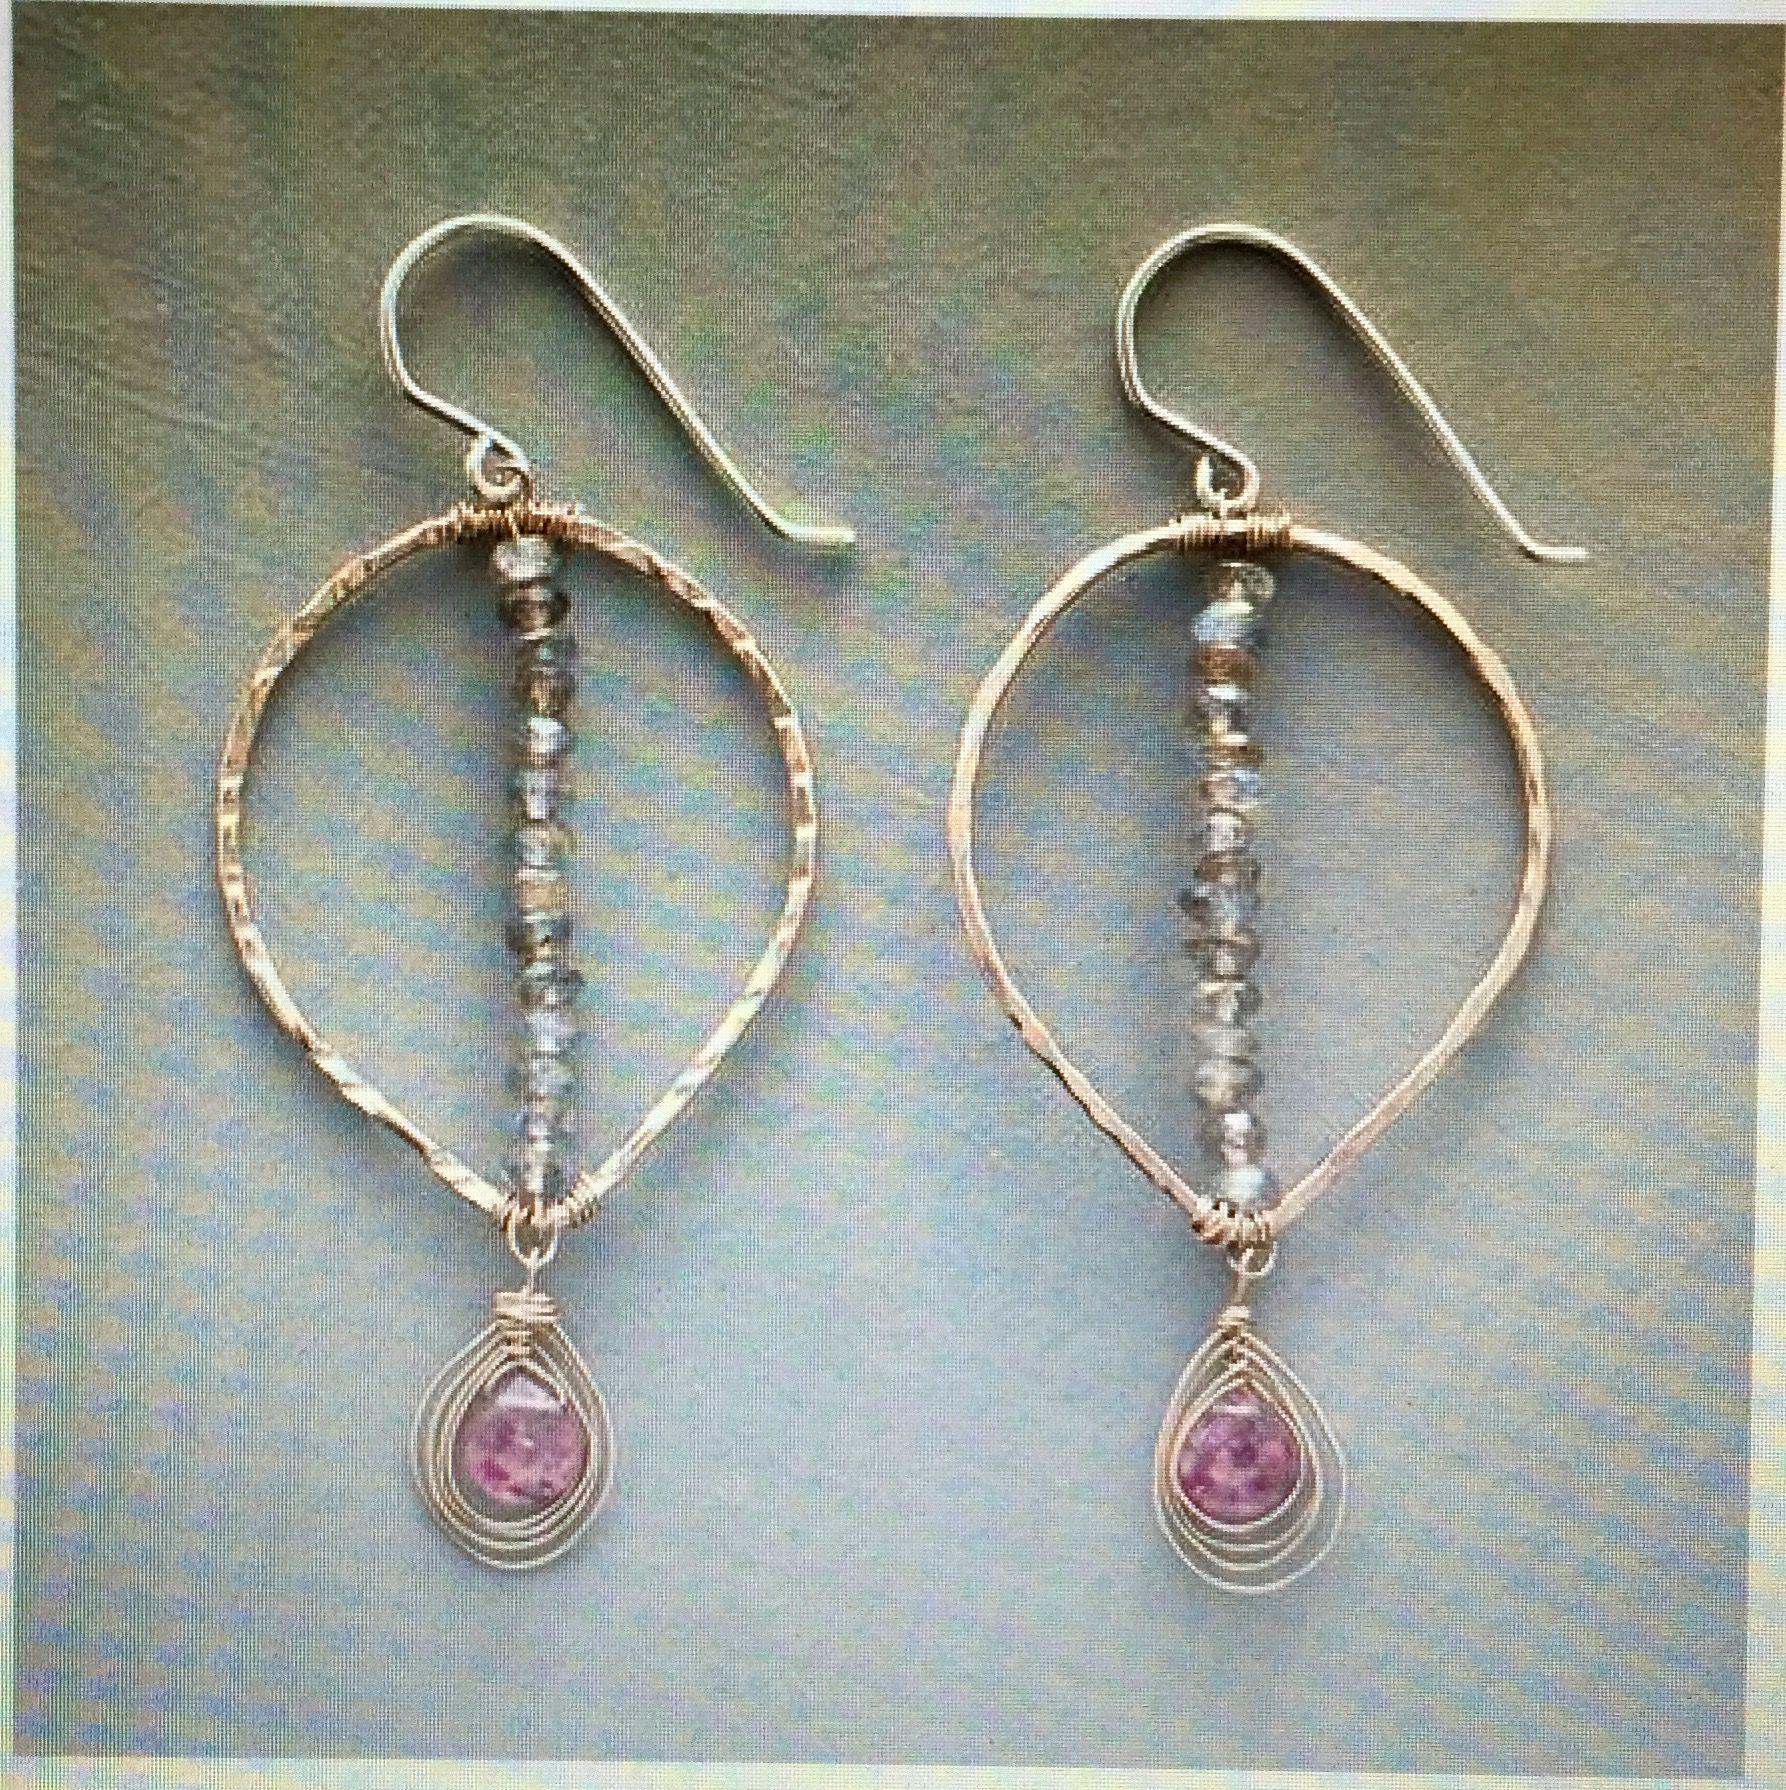 Pin by rhonda west on jewelry pinterest